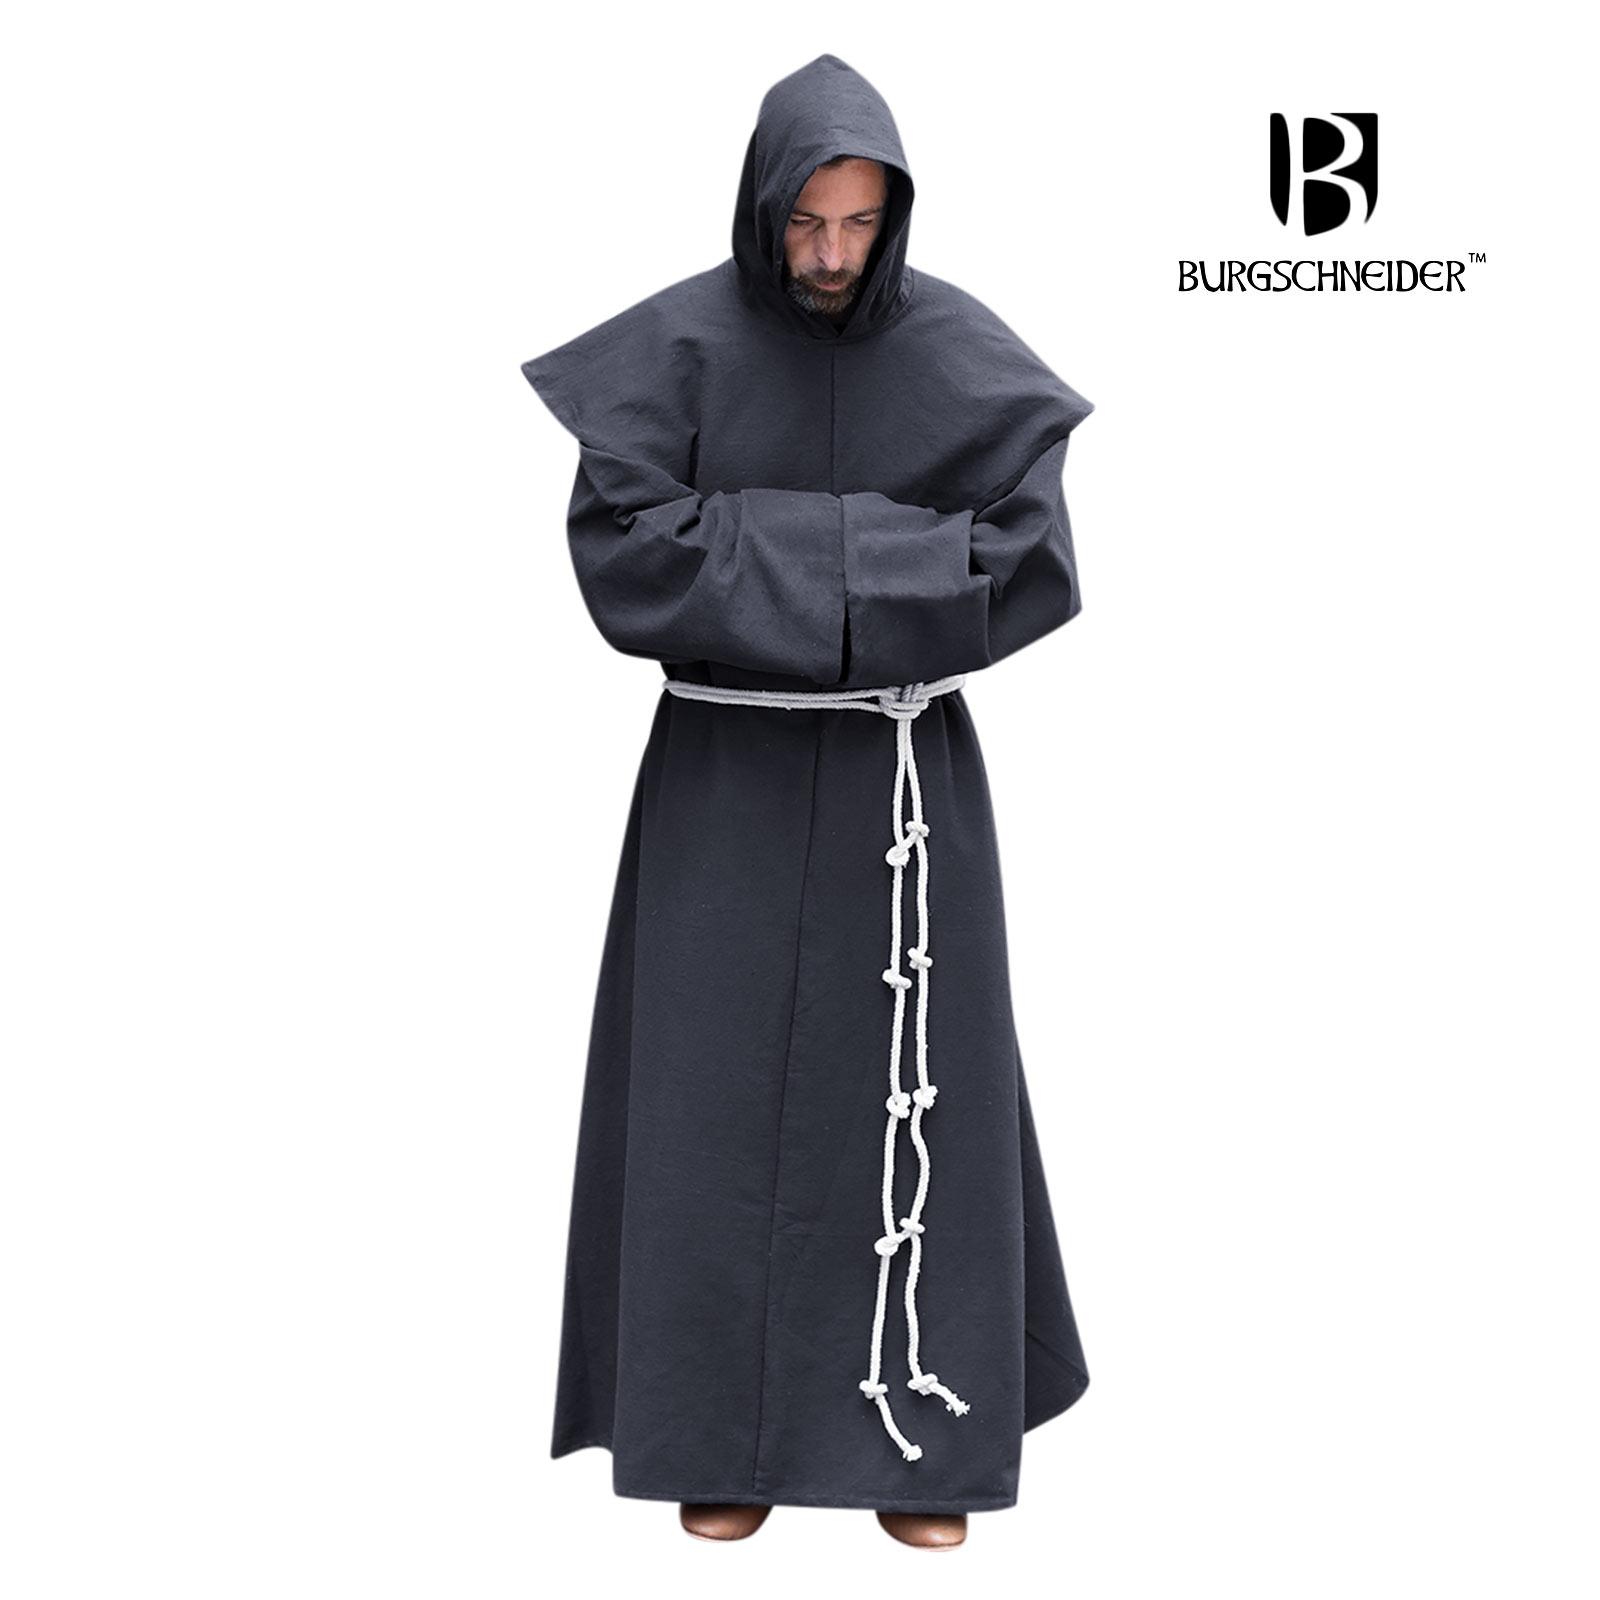 Mönchskutte Benediktus schwarz